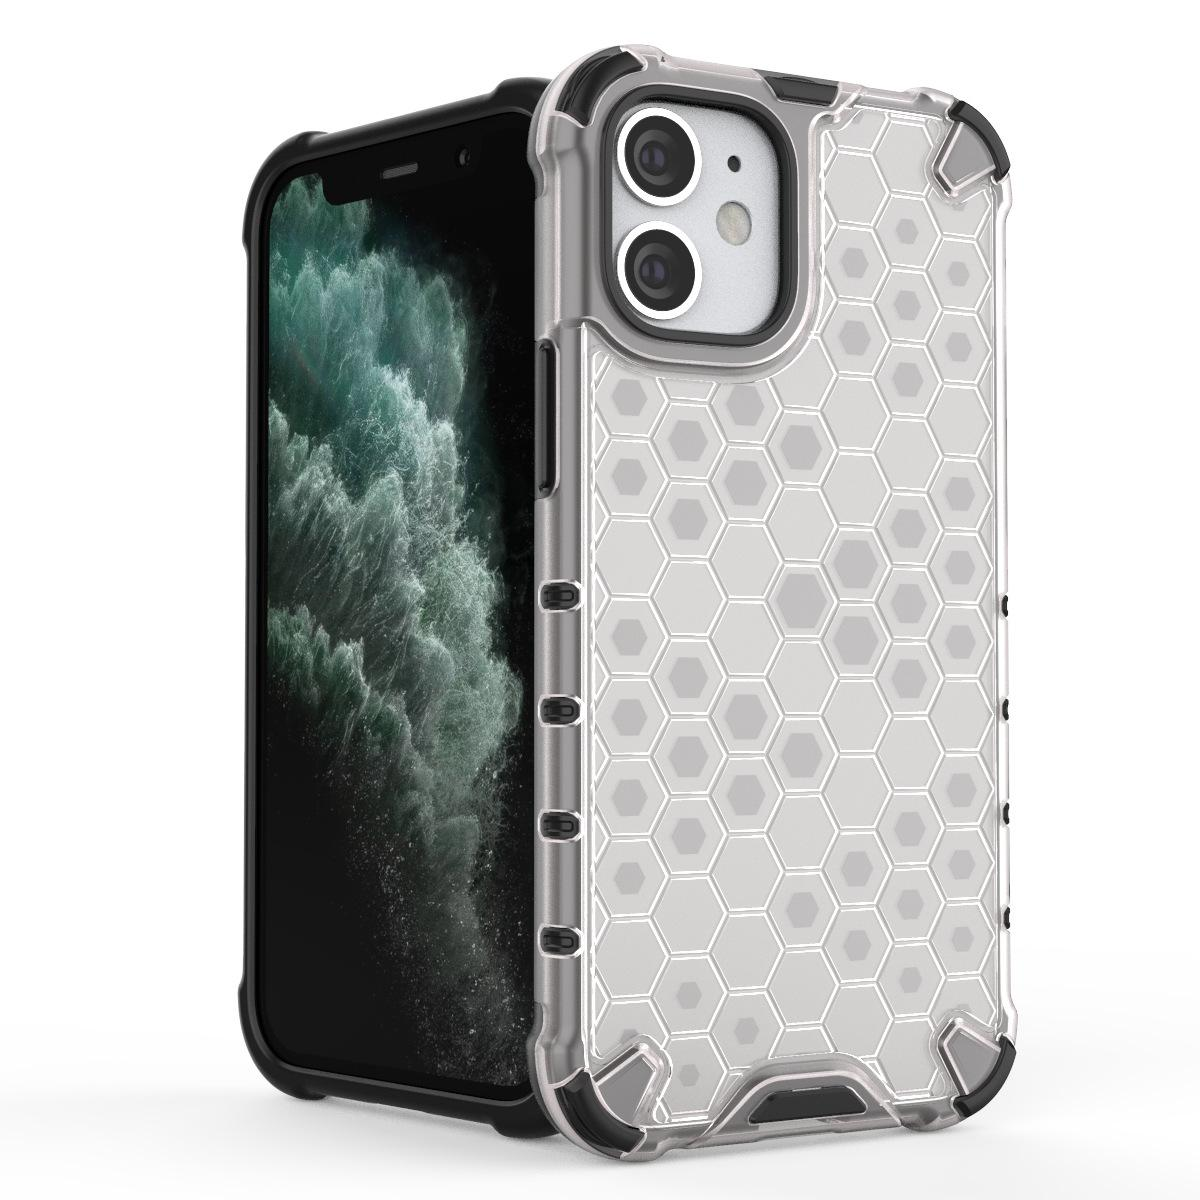 STRAGAL STOUCKUE ARMOR CABLE для iPhone 12 Mini 11 Pro Max Counce Counce Conse для iPhone XR X XS 6 6S 7 8 Plus SE 2020 чехлы